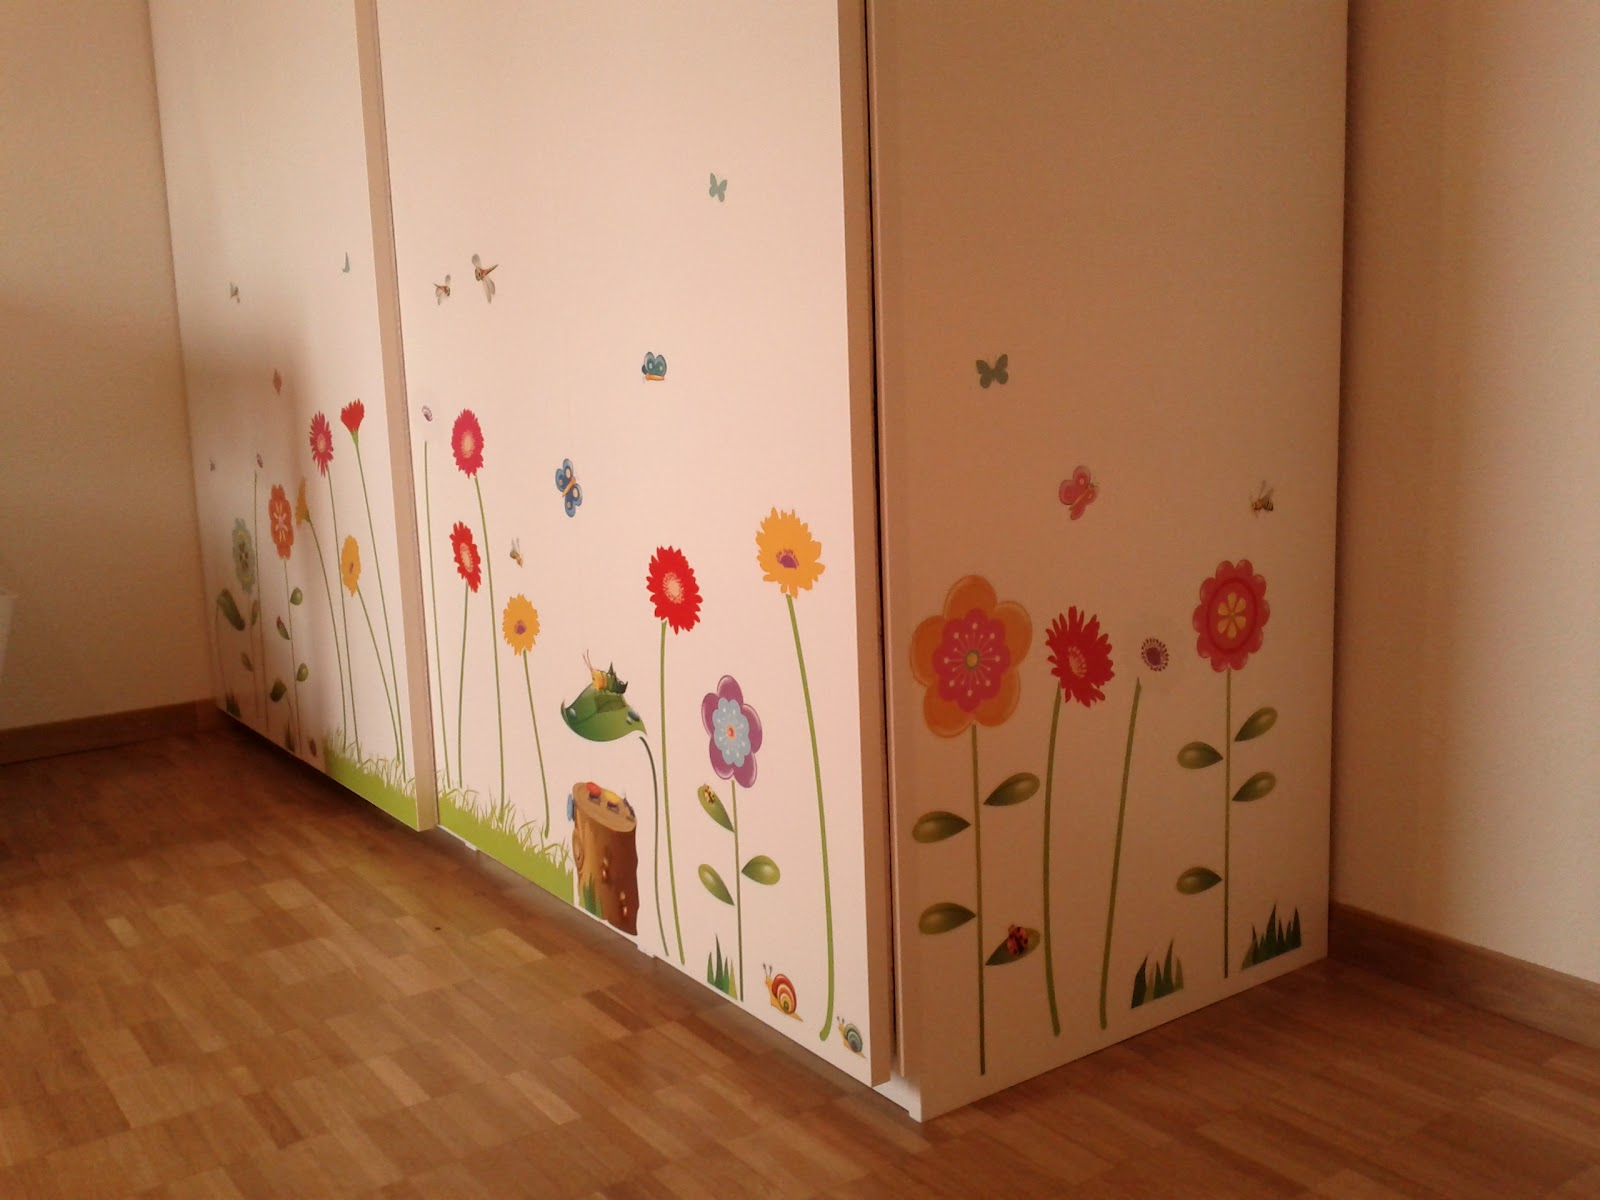 Zona aurelia ma anche livia come ti cambio l 39 armadio ikea - Ikea armadi a muro ...